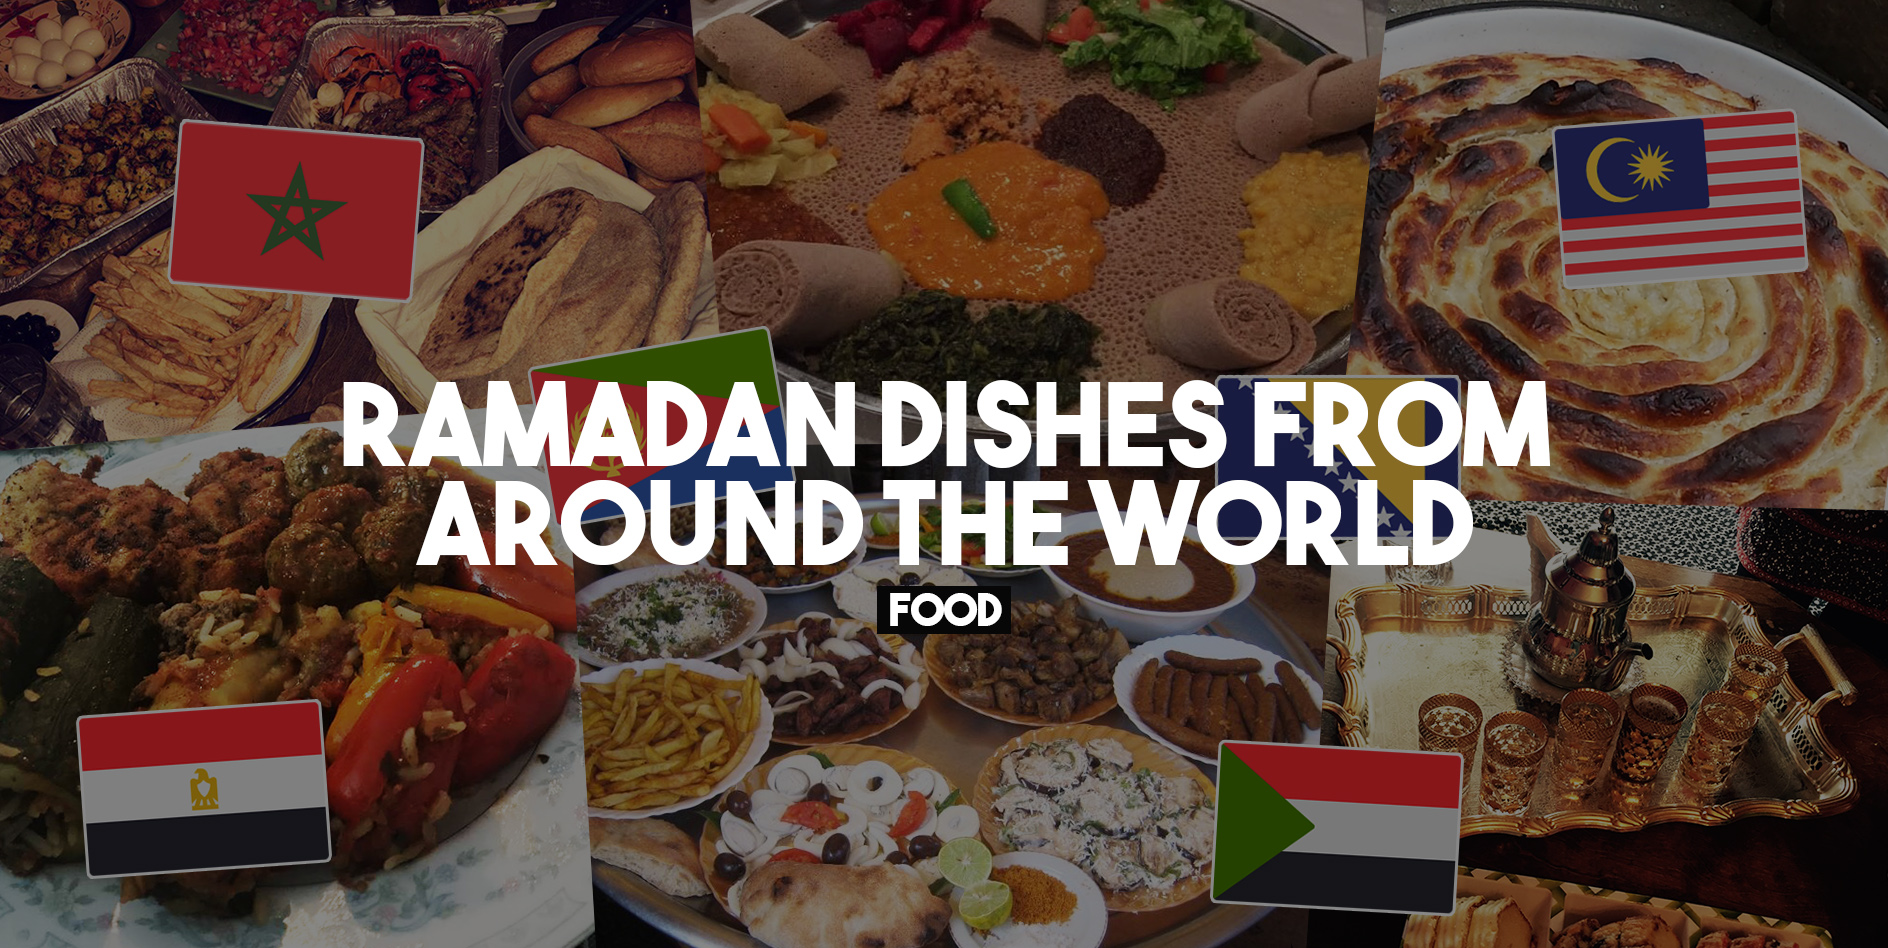 ramadandishesaroundtheworld.jpg